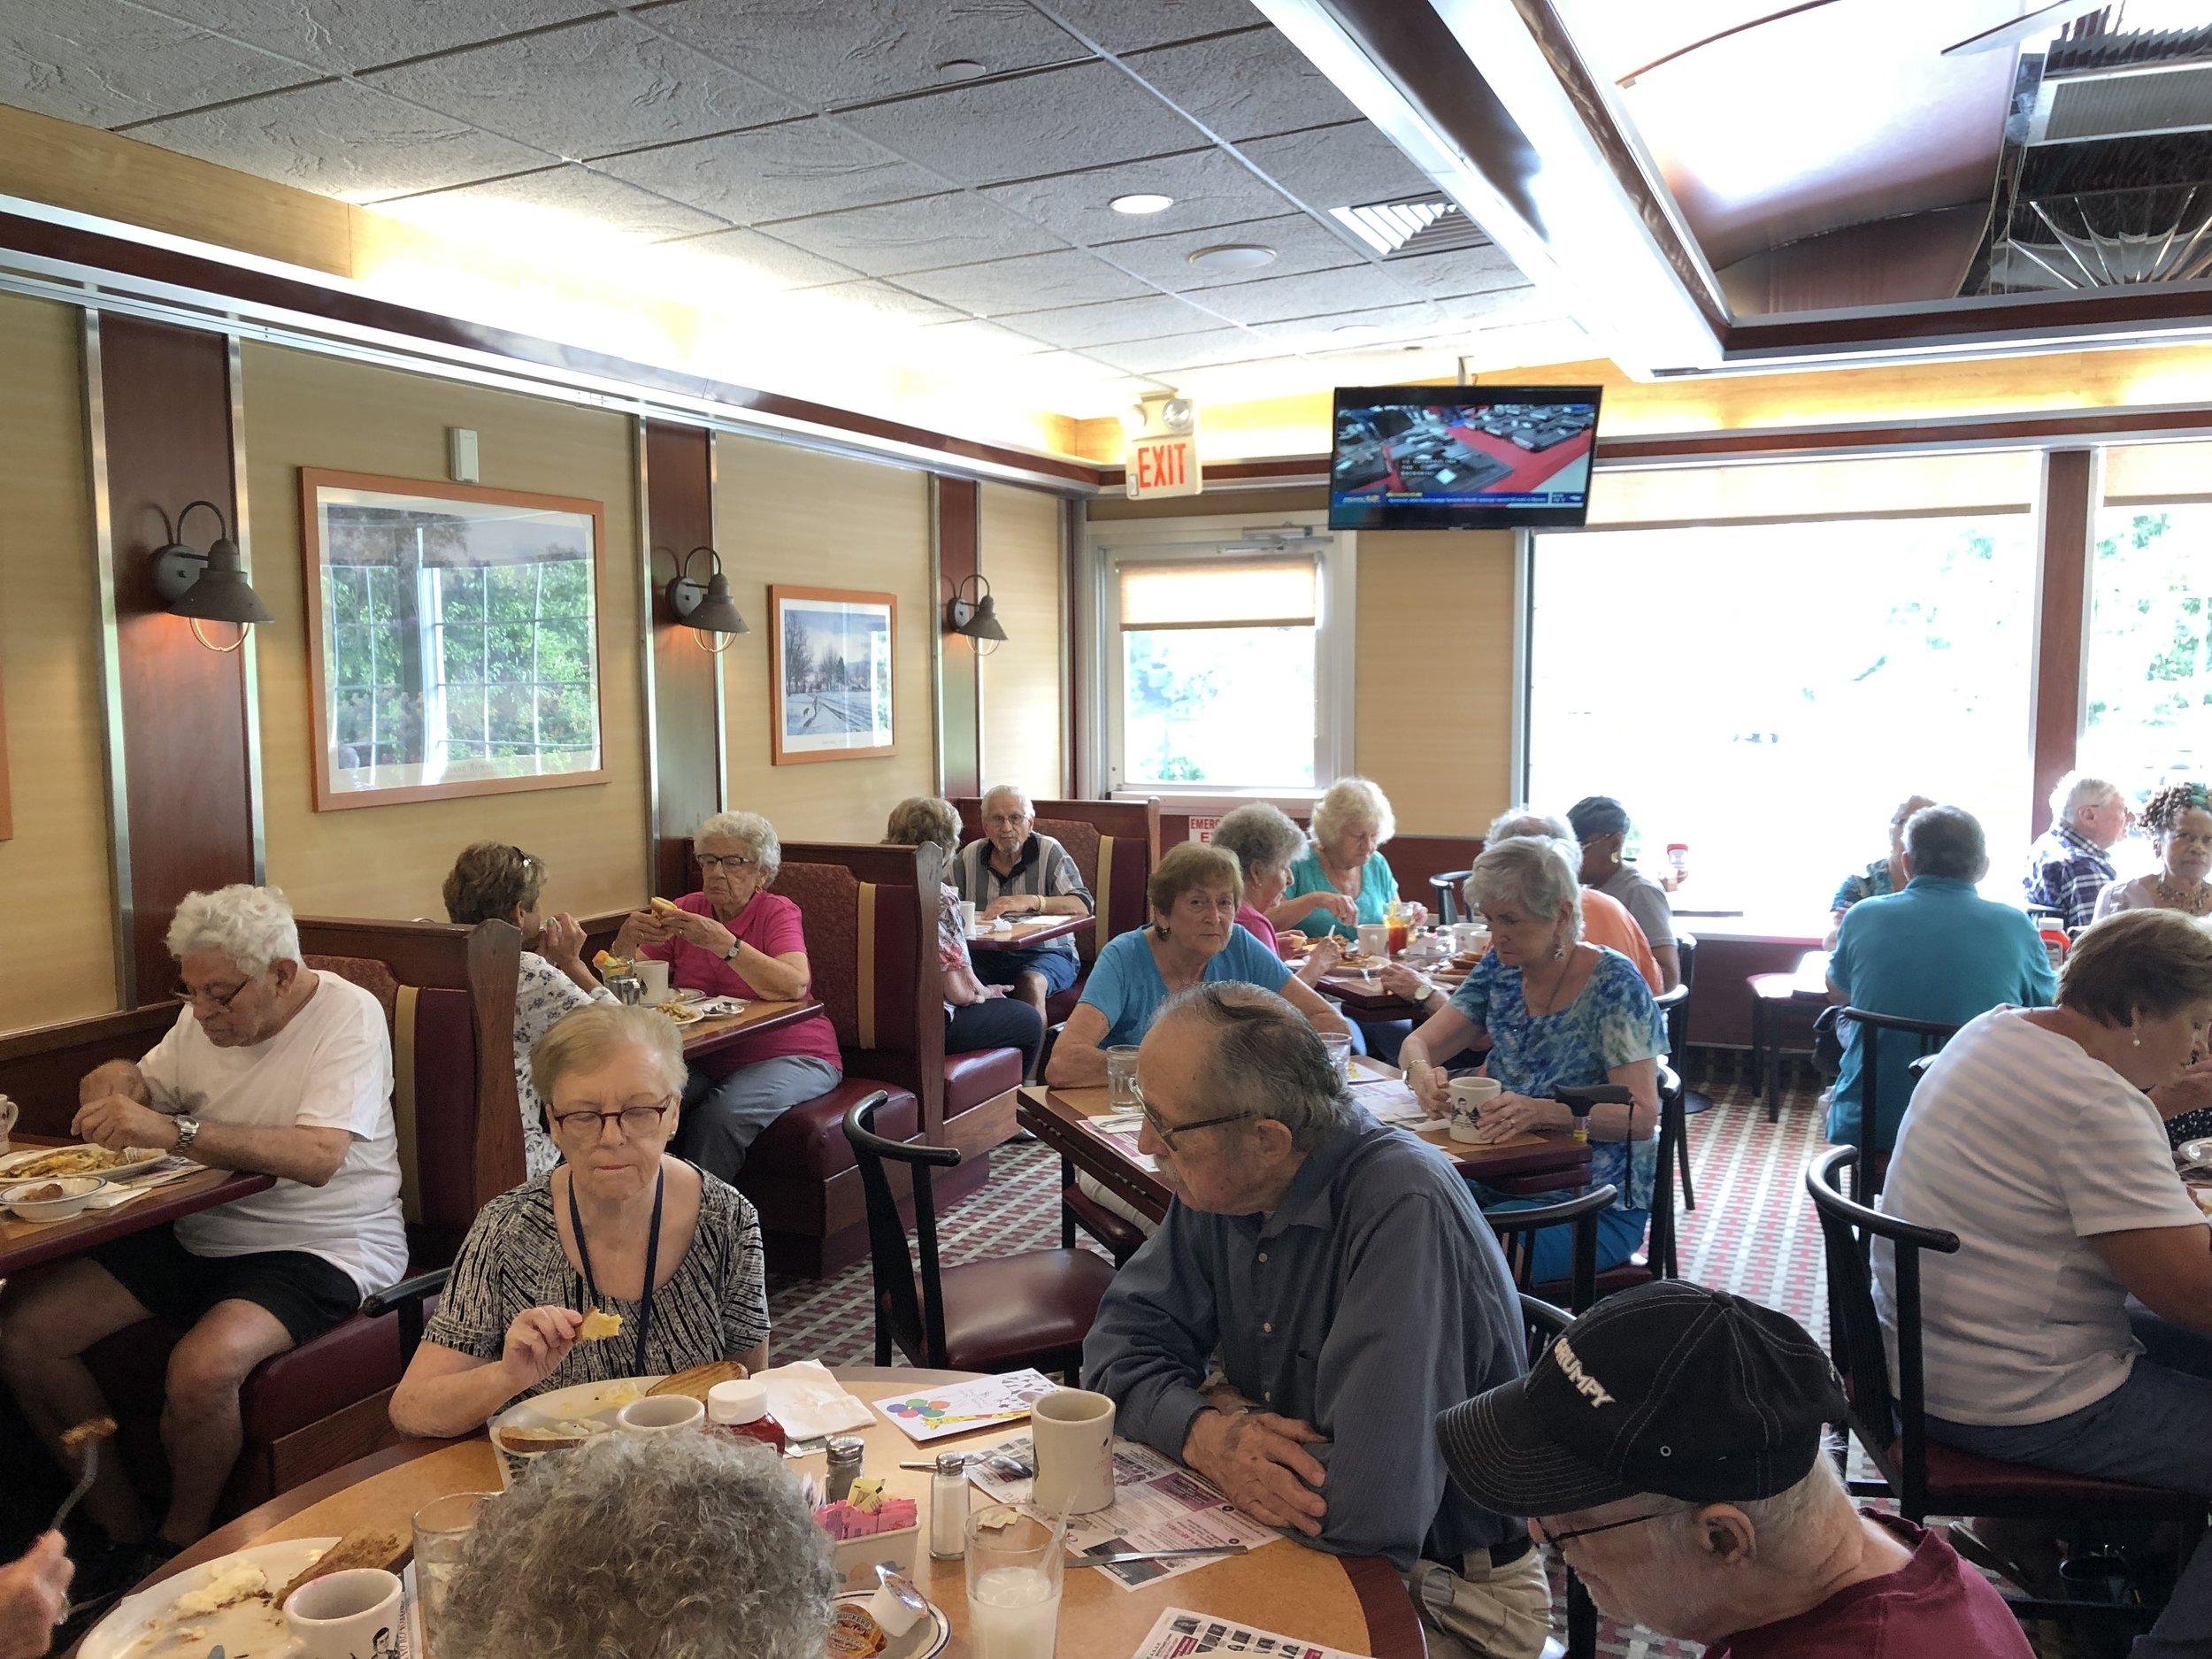 National Senior Citizens Day Celebration - August 21, 2019